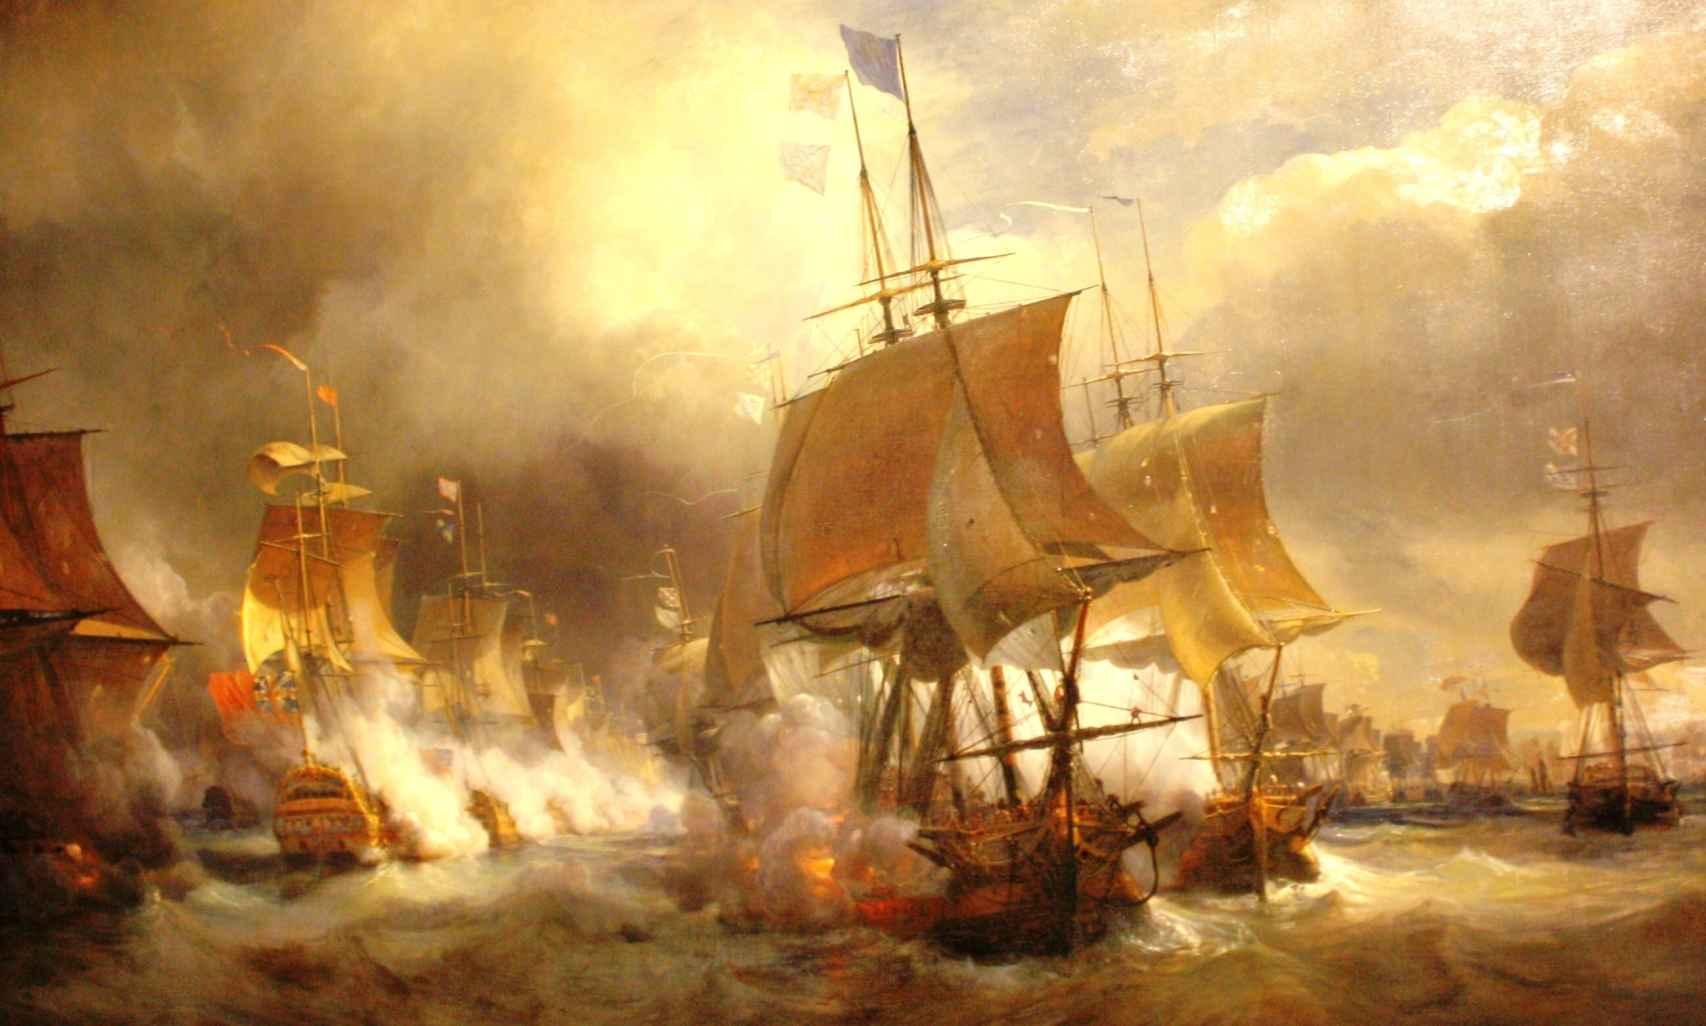 Batalla naval de Ushant (1778), por Théodore Gudin.